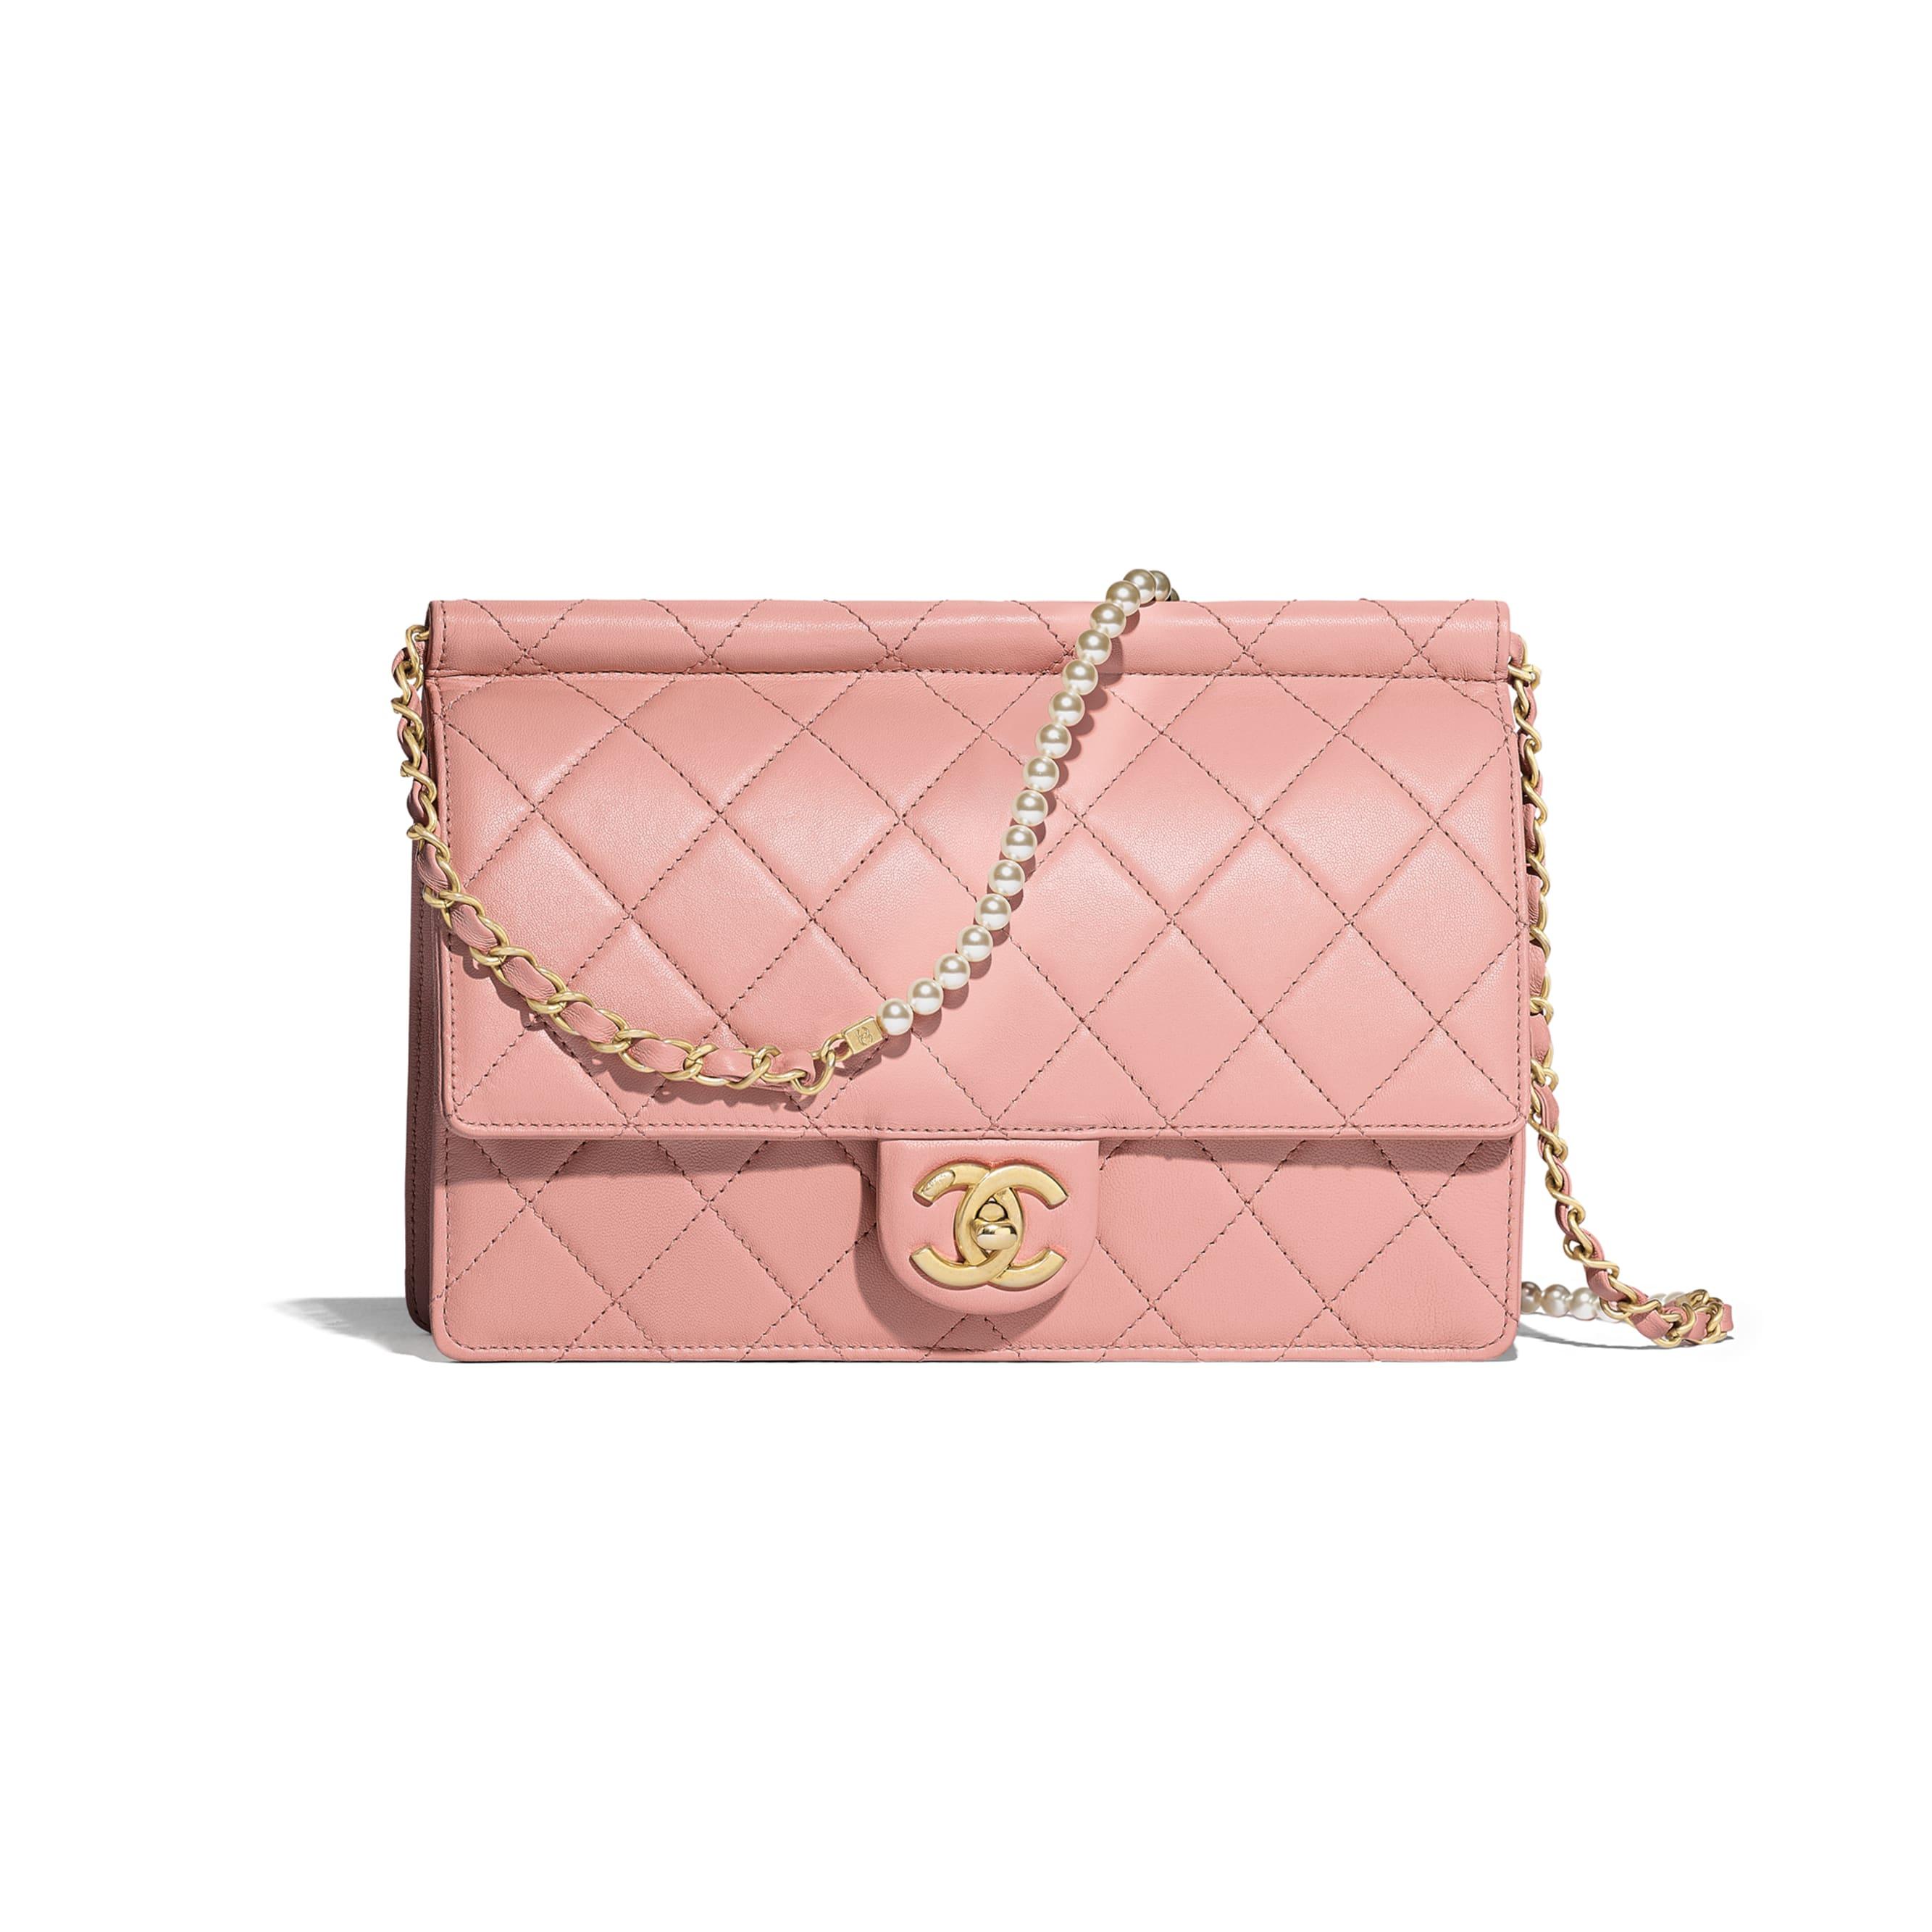 Flap Bag - Pink - Lambskin, Imitation Pearls & Gold-Tone Metal - Default view - see standard sized version